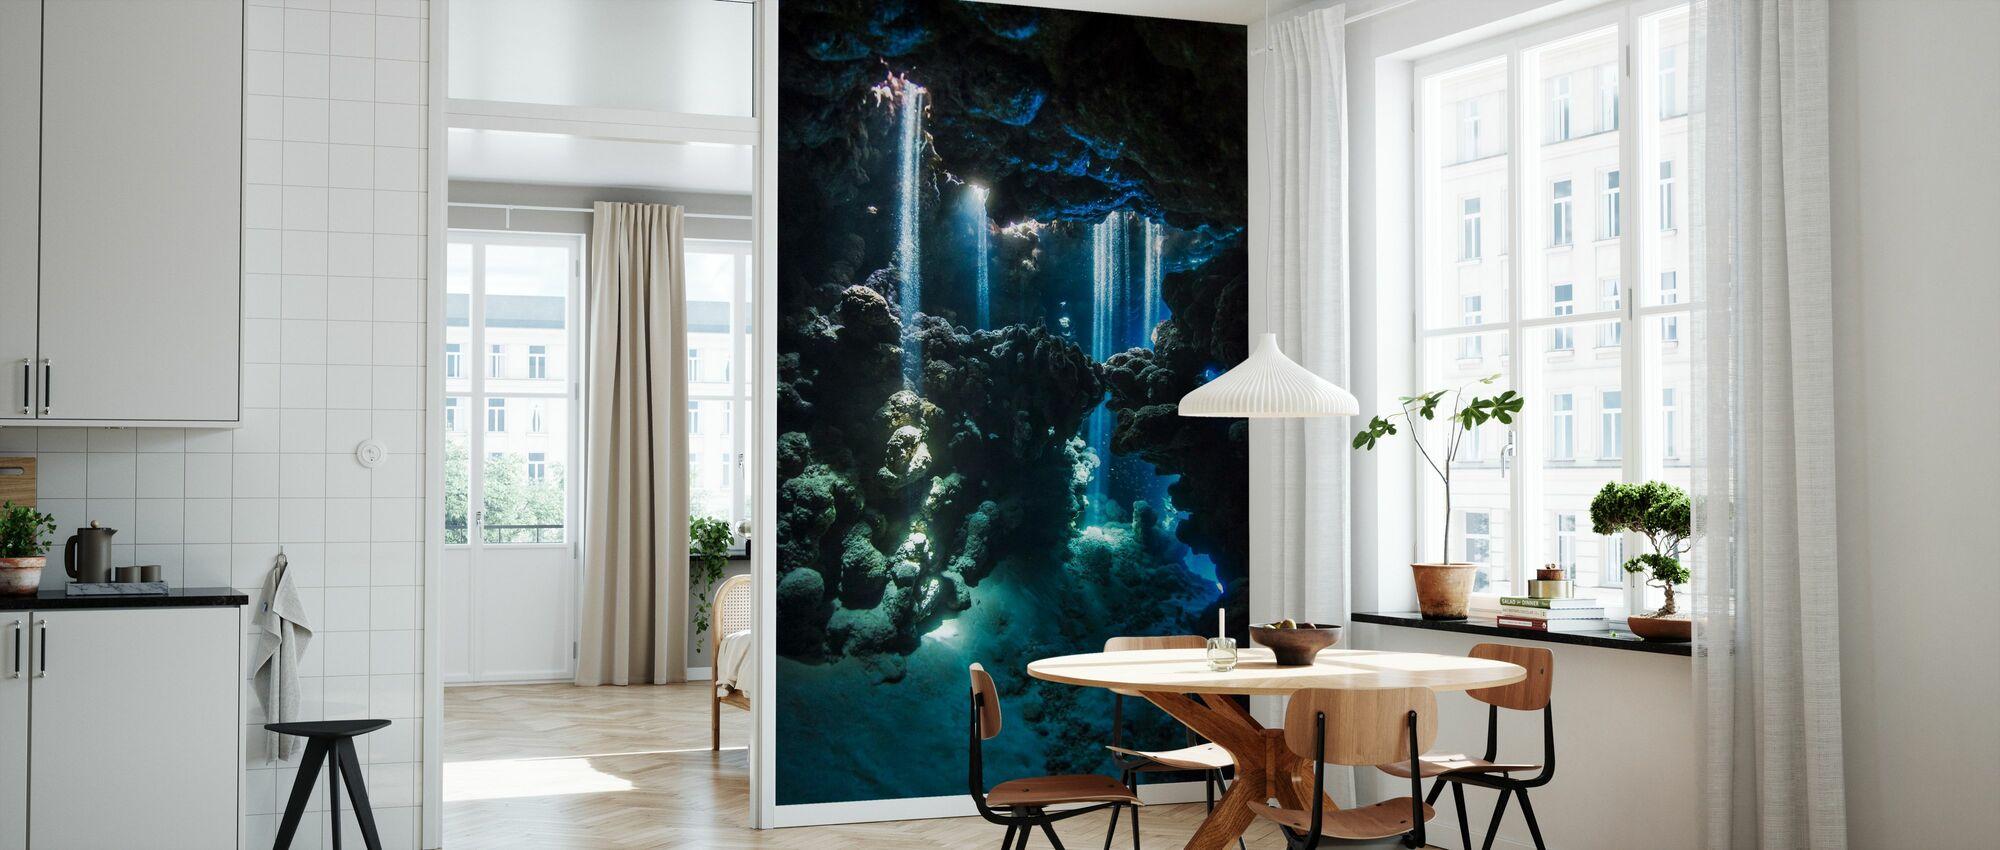 Shafts of Light - Wallpaper - Kitchen